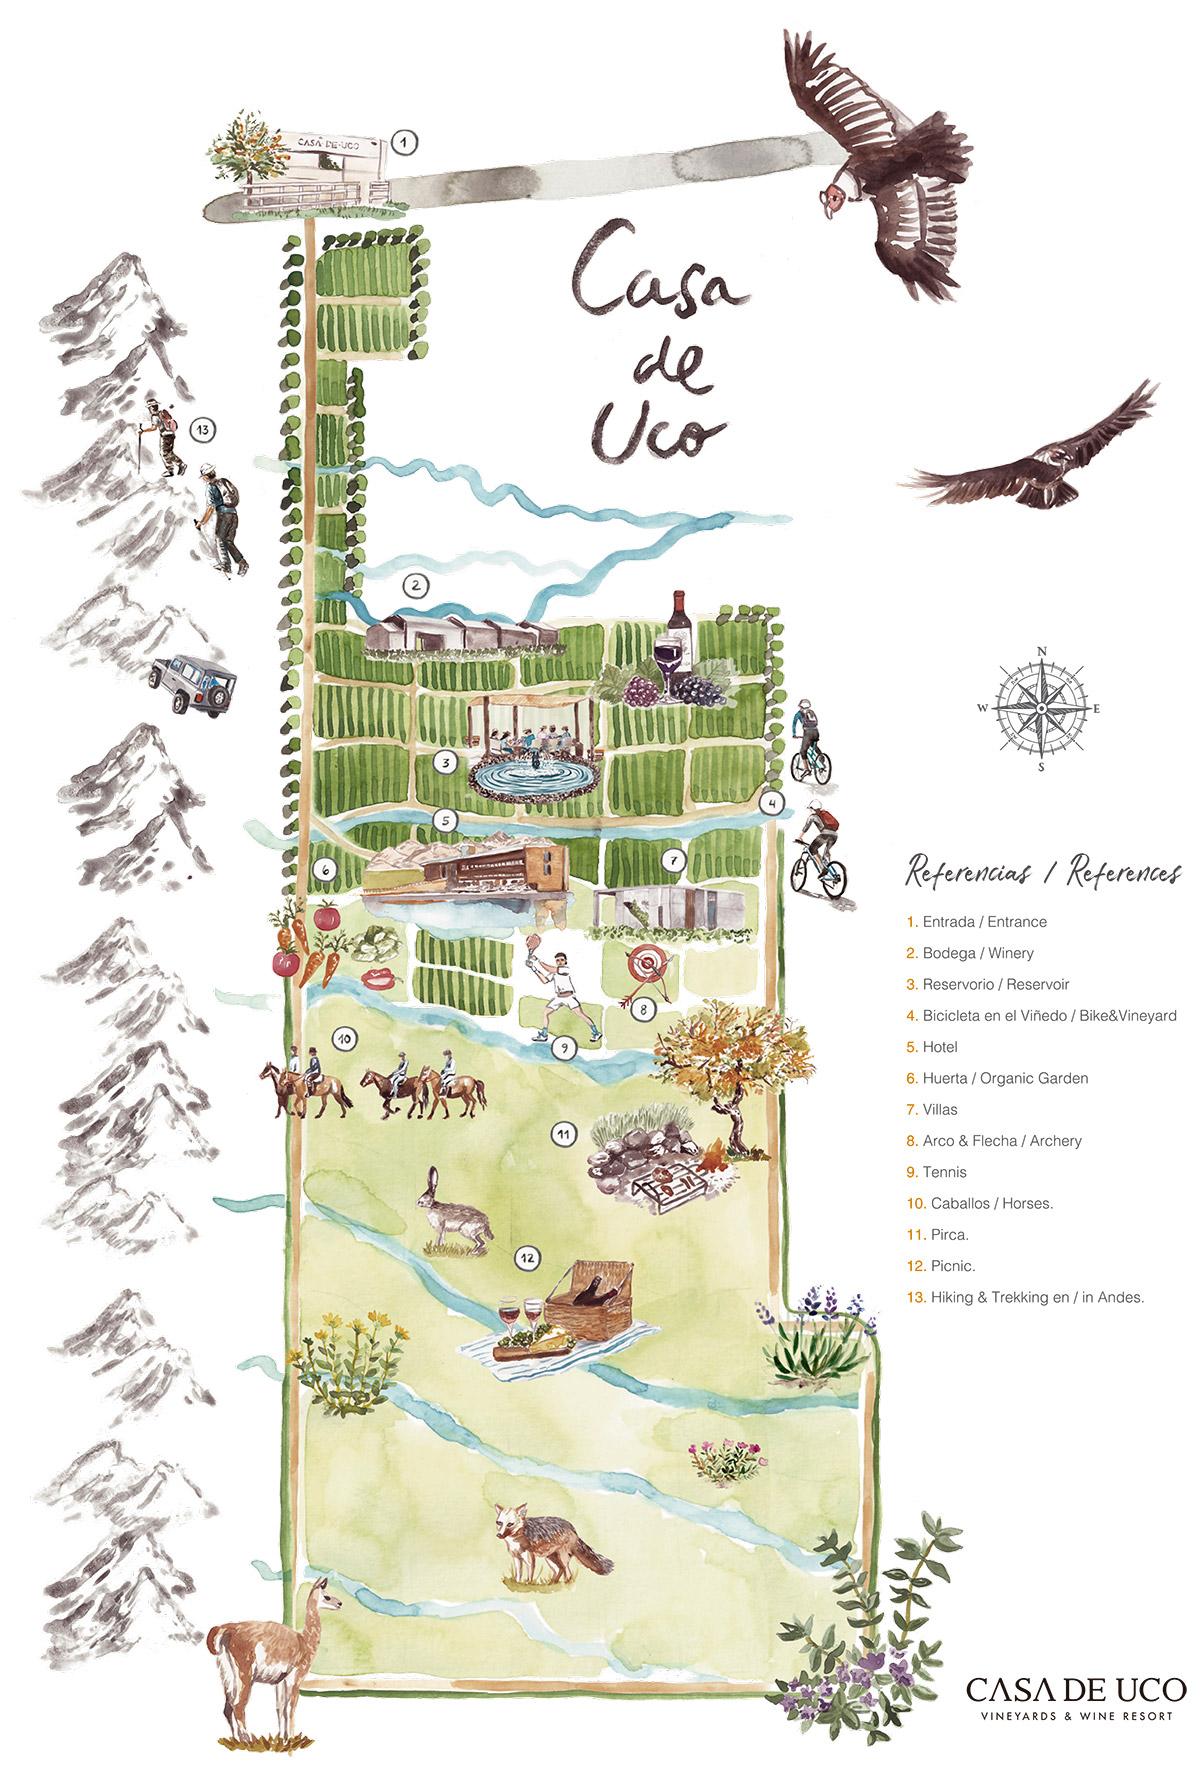 Casa de Uco Map